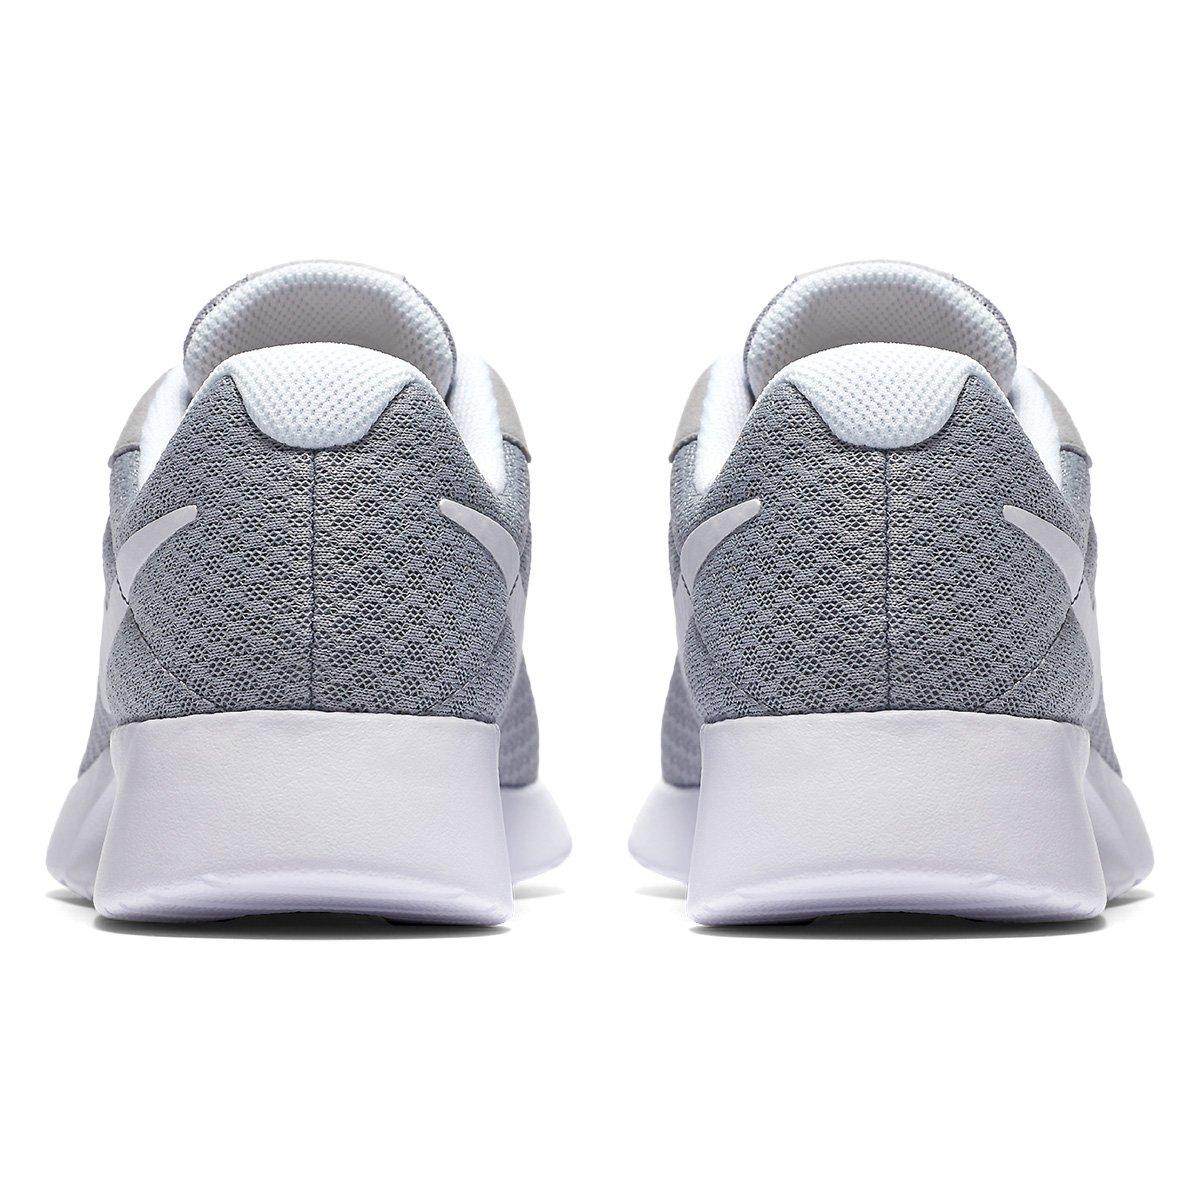 Tênis Nike Tanjun Feminino - Cinza e Branco - Compre Agora  768b748c2efb3